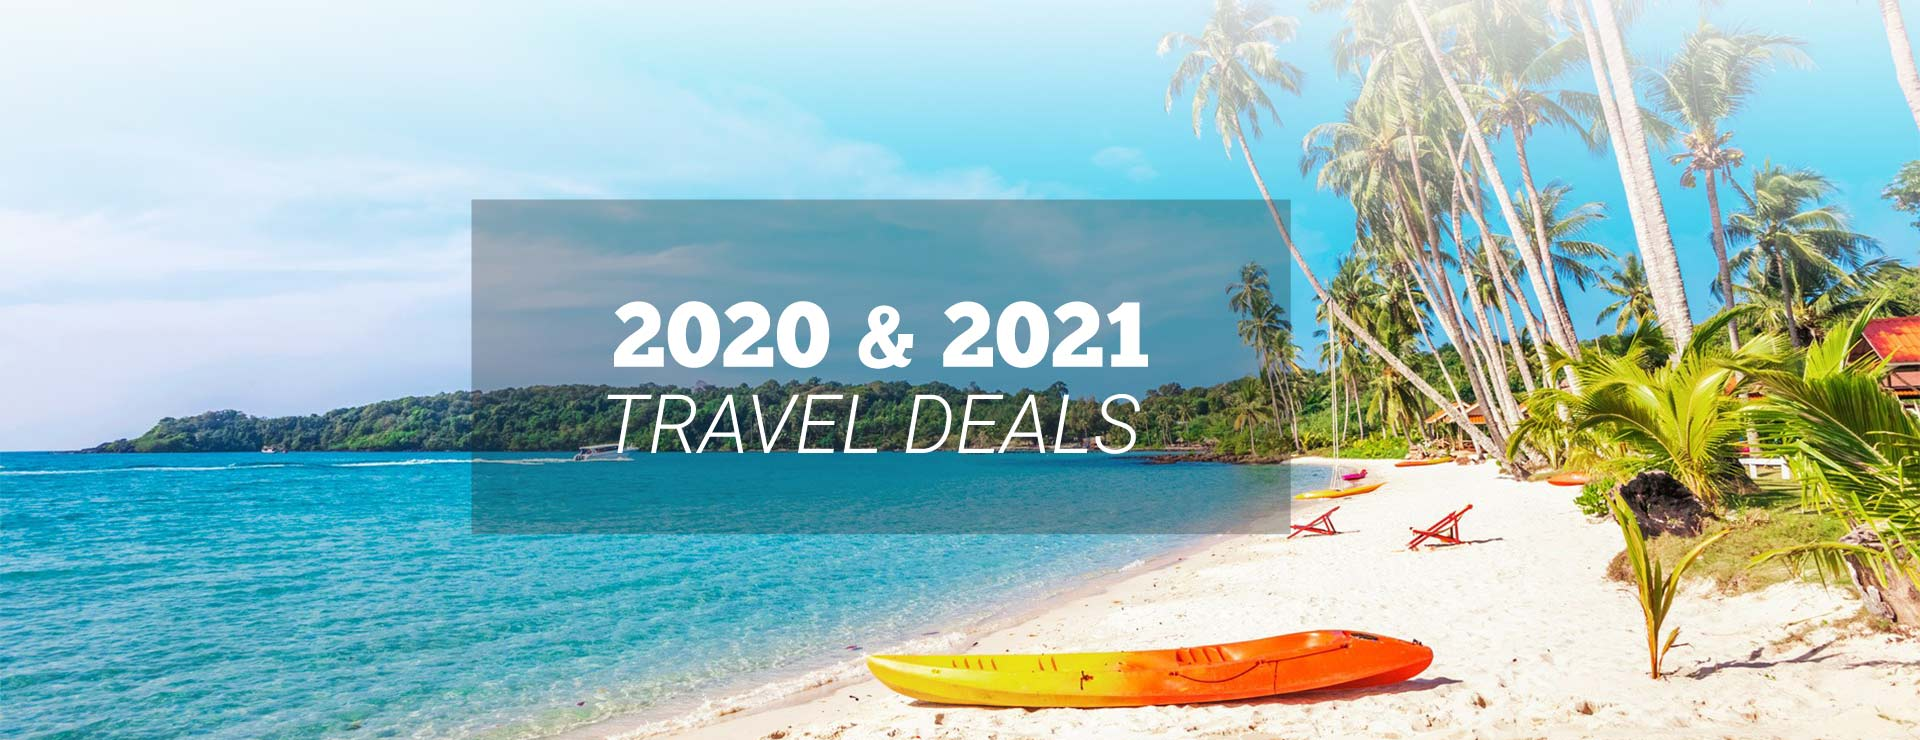 Vietnam Travel Deals 2020